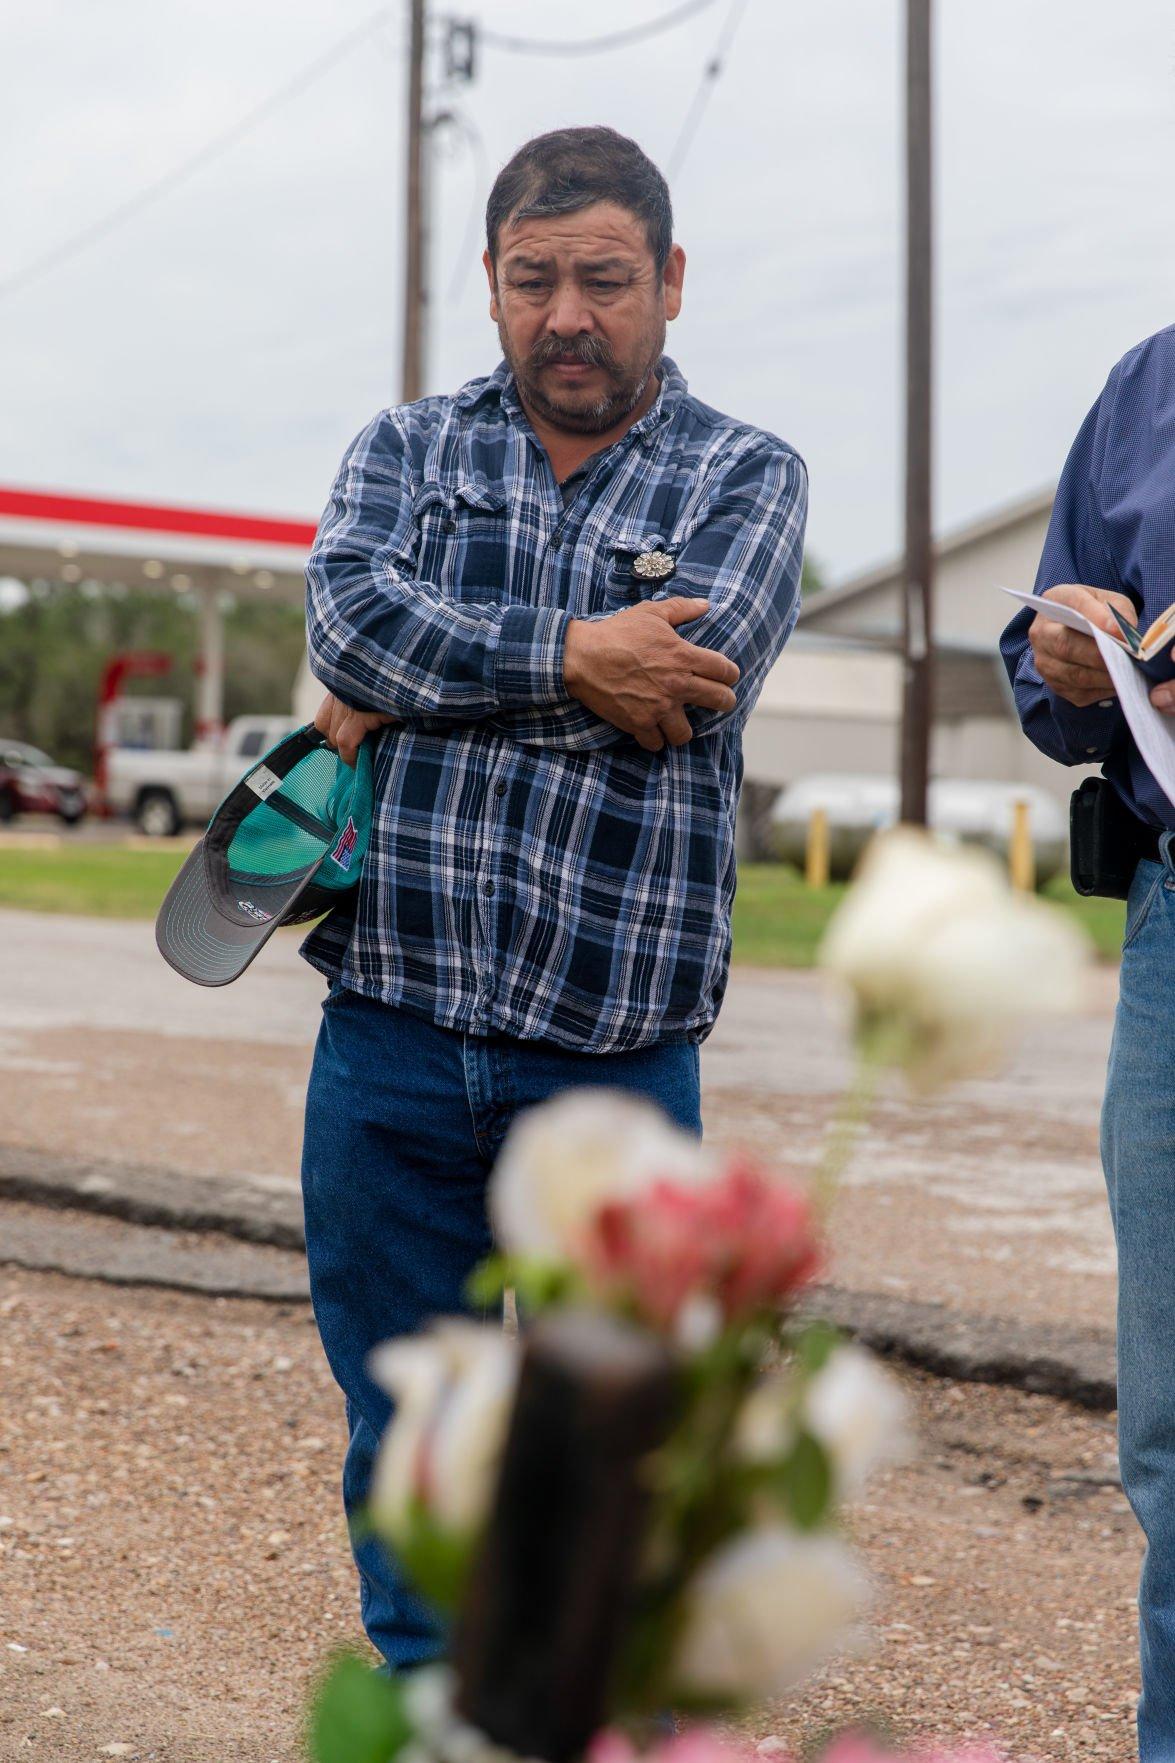 Immigrants' Death Memorial Service